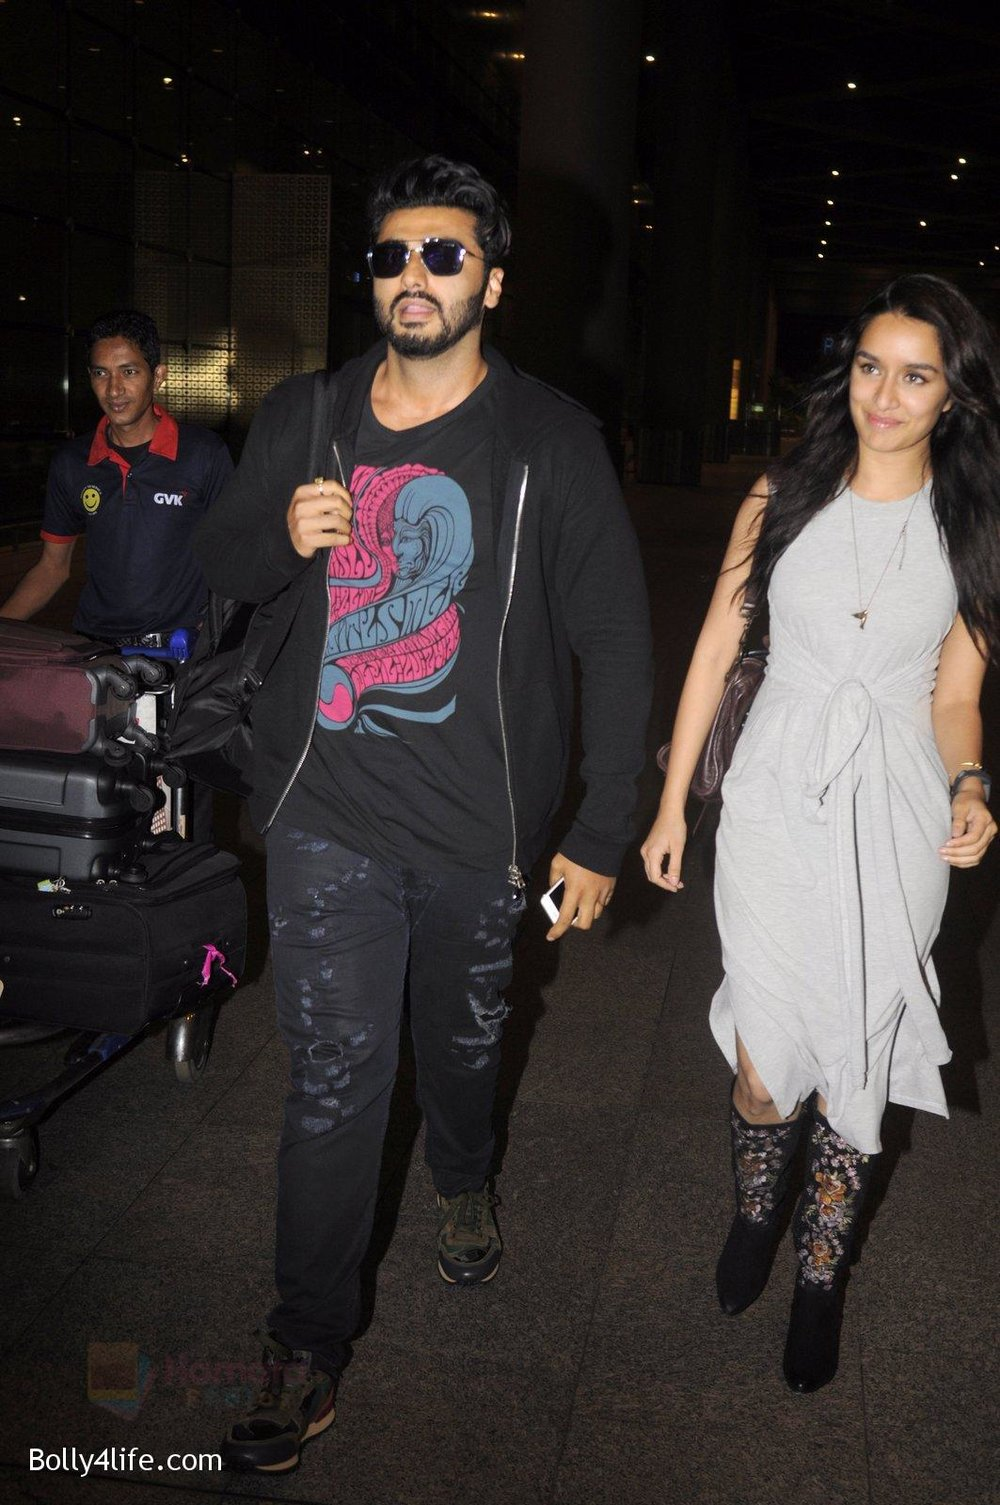 Shraddha-Kapoor-and-Arjun-Kapoor-return-from-NY-on-15th-Sept-2016-12.jpg